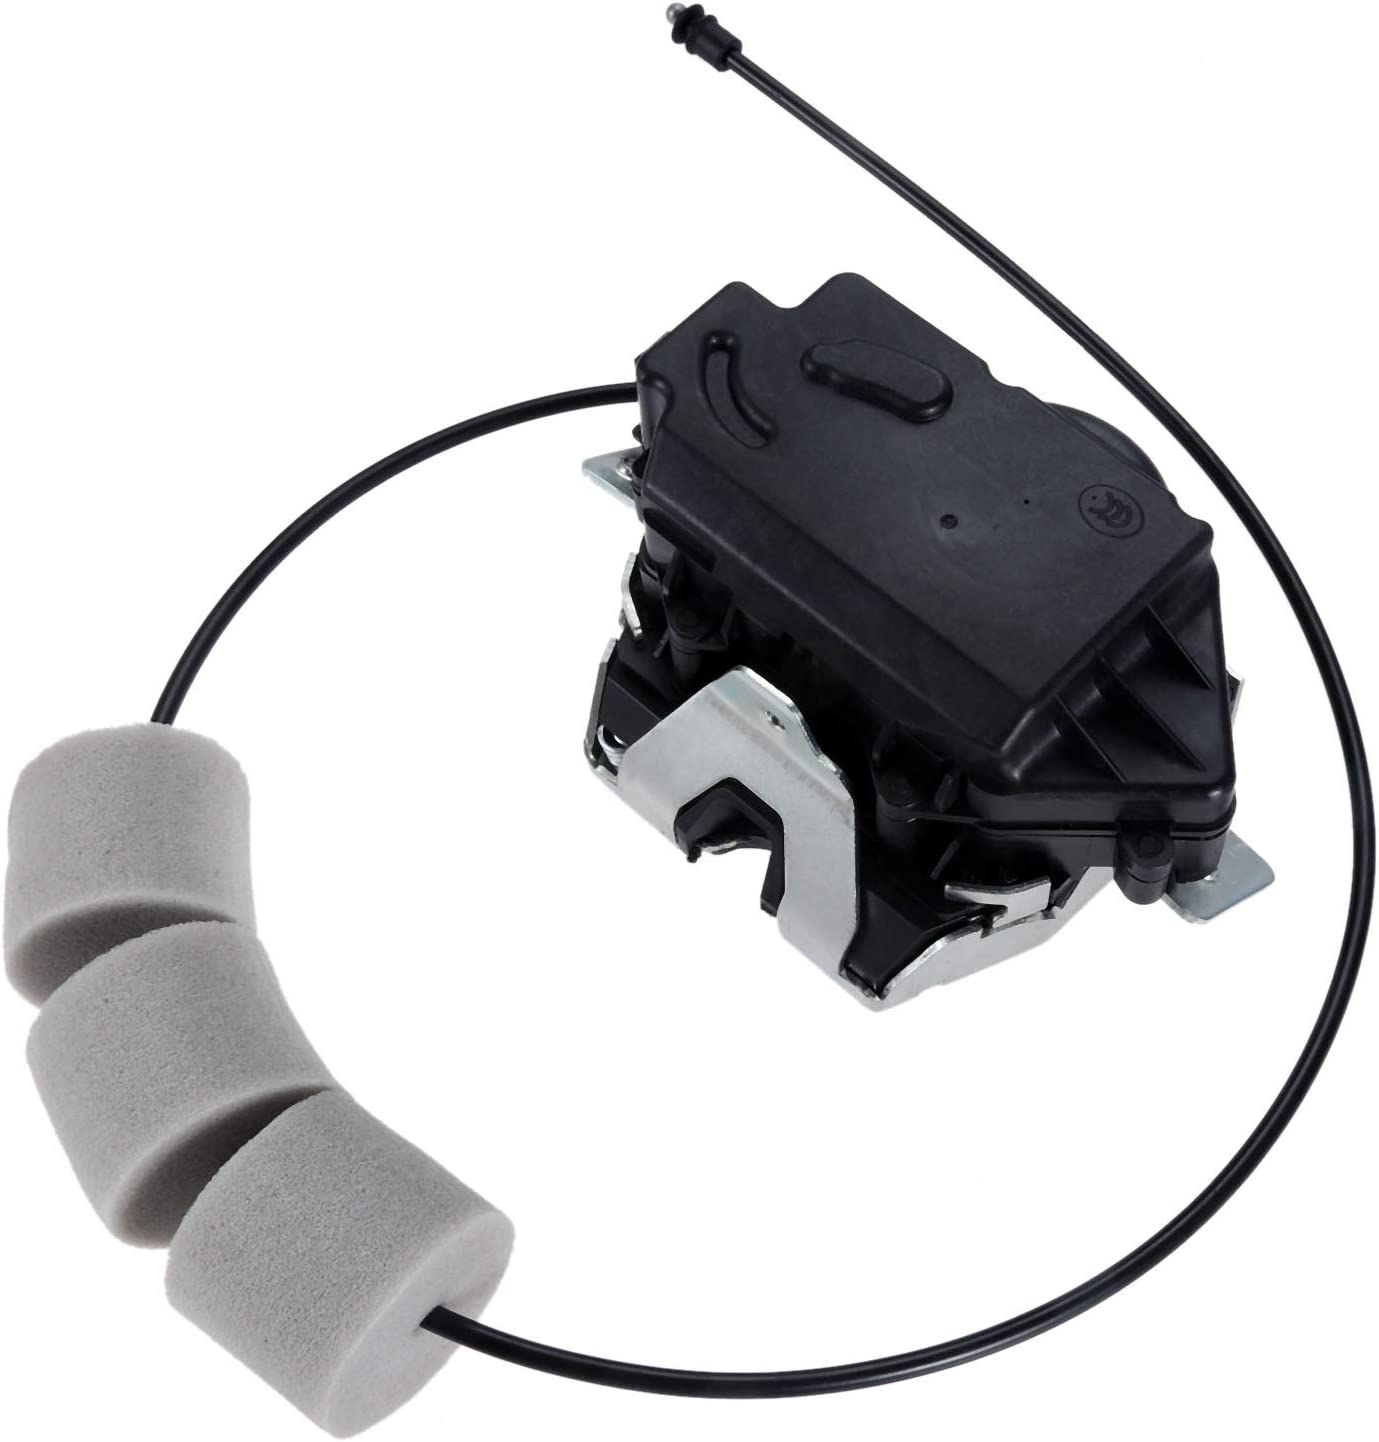 AUTOPA 1647400735 Rear Tailgate Trunk Lift Door Hatch Lock Actuator for Mercedes W164 X164 V251 GL320 GL450 R350 ML500